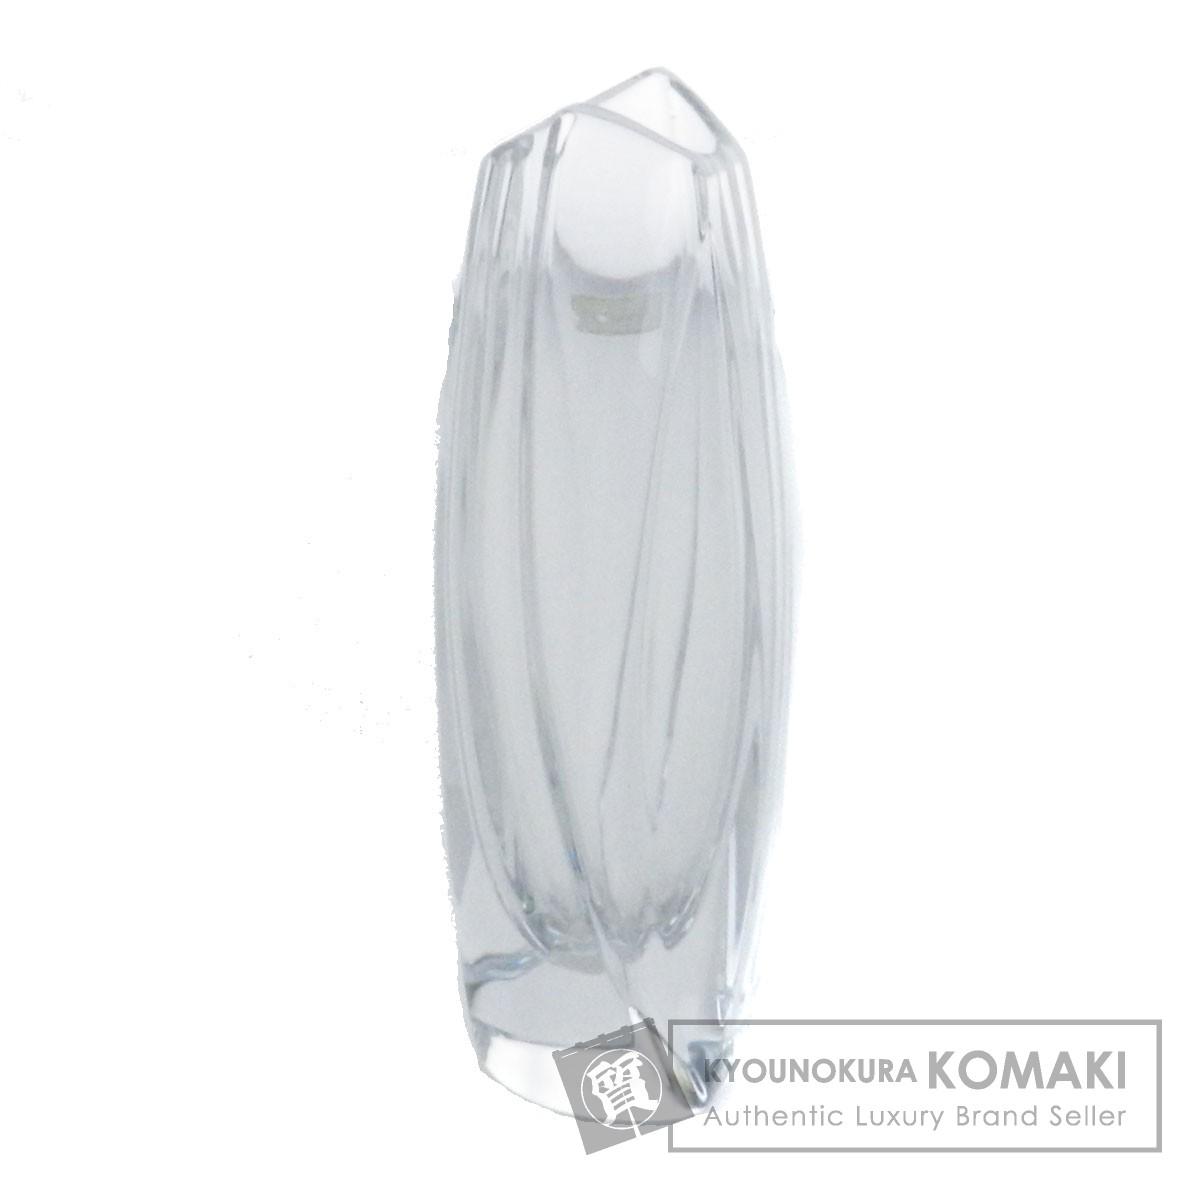 Baccarat ジベルニー 一輪挿し 花瓶 オブジェ クリスタルガラス レディース 【中古】【バカラ】